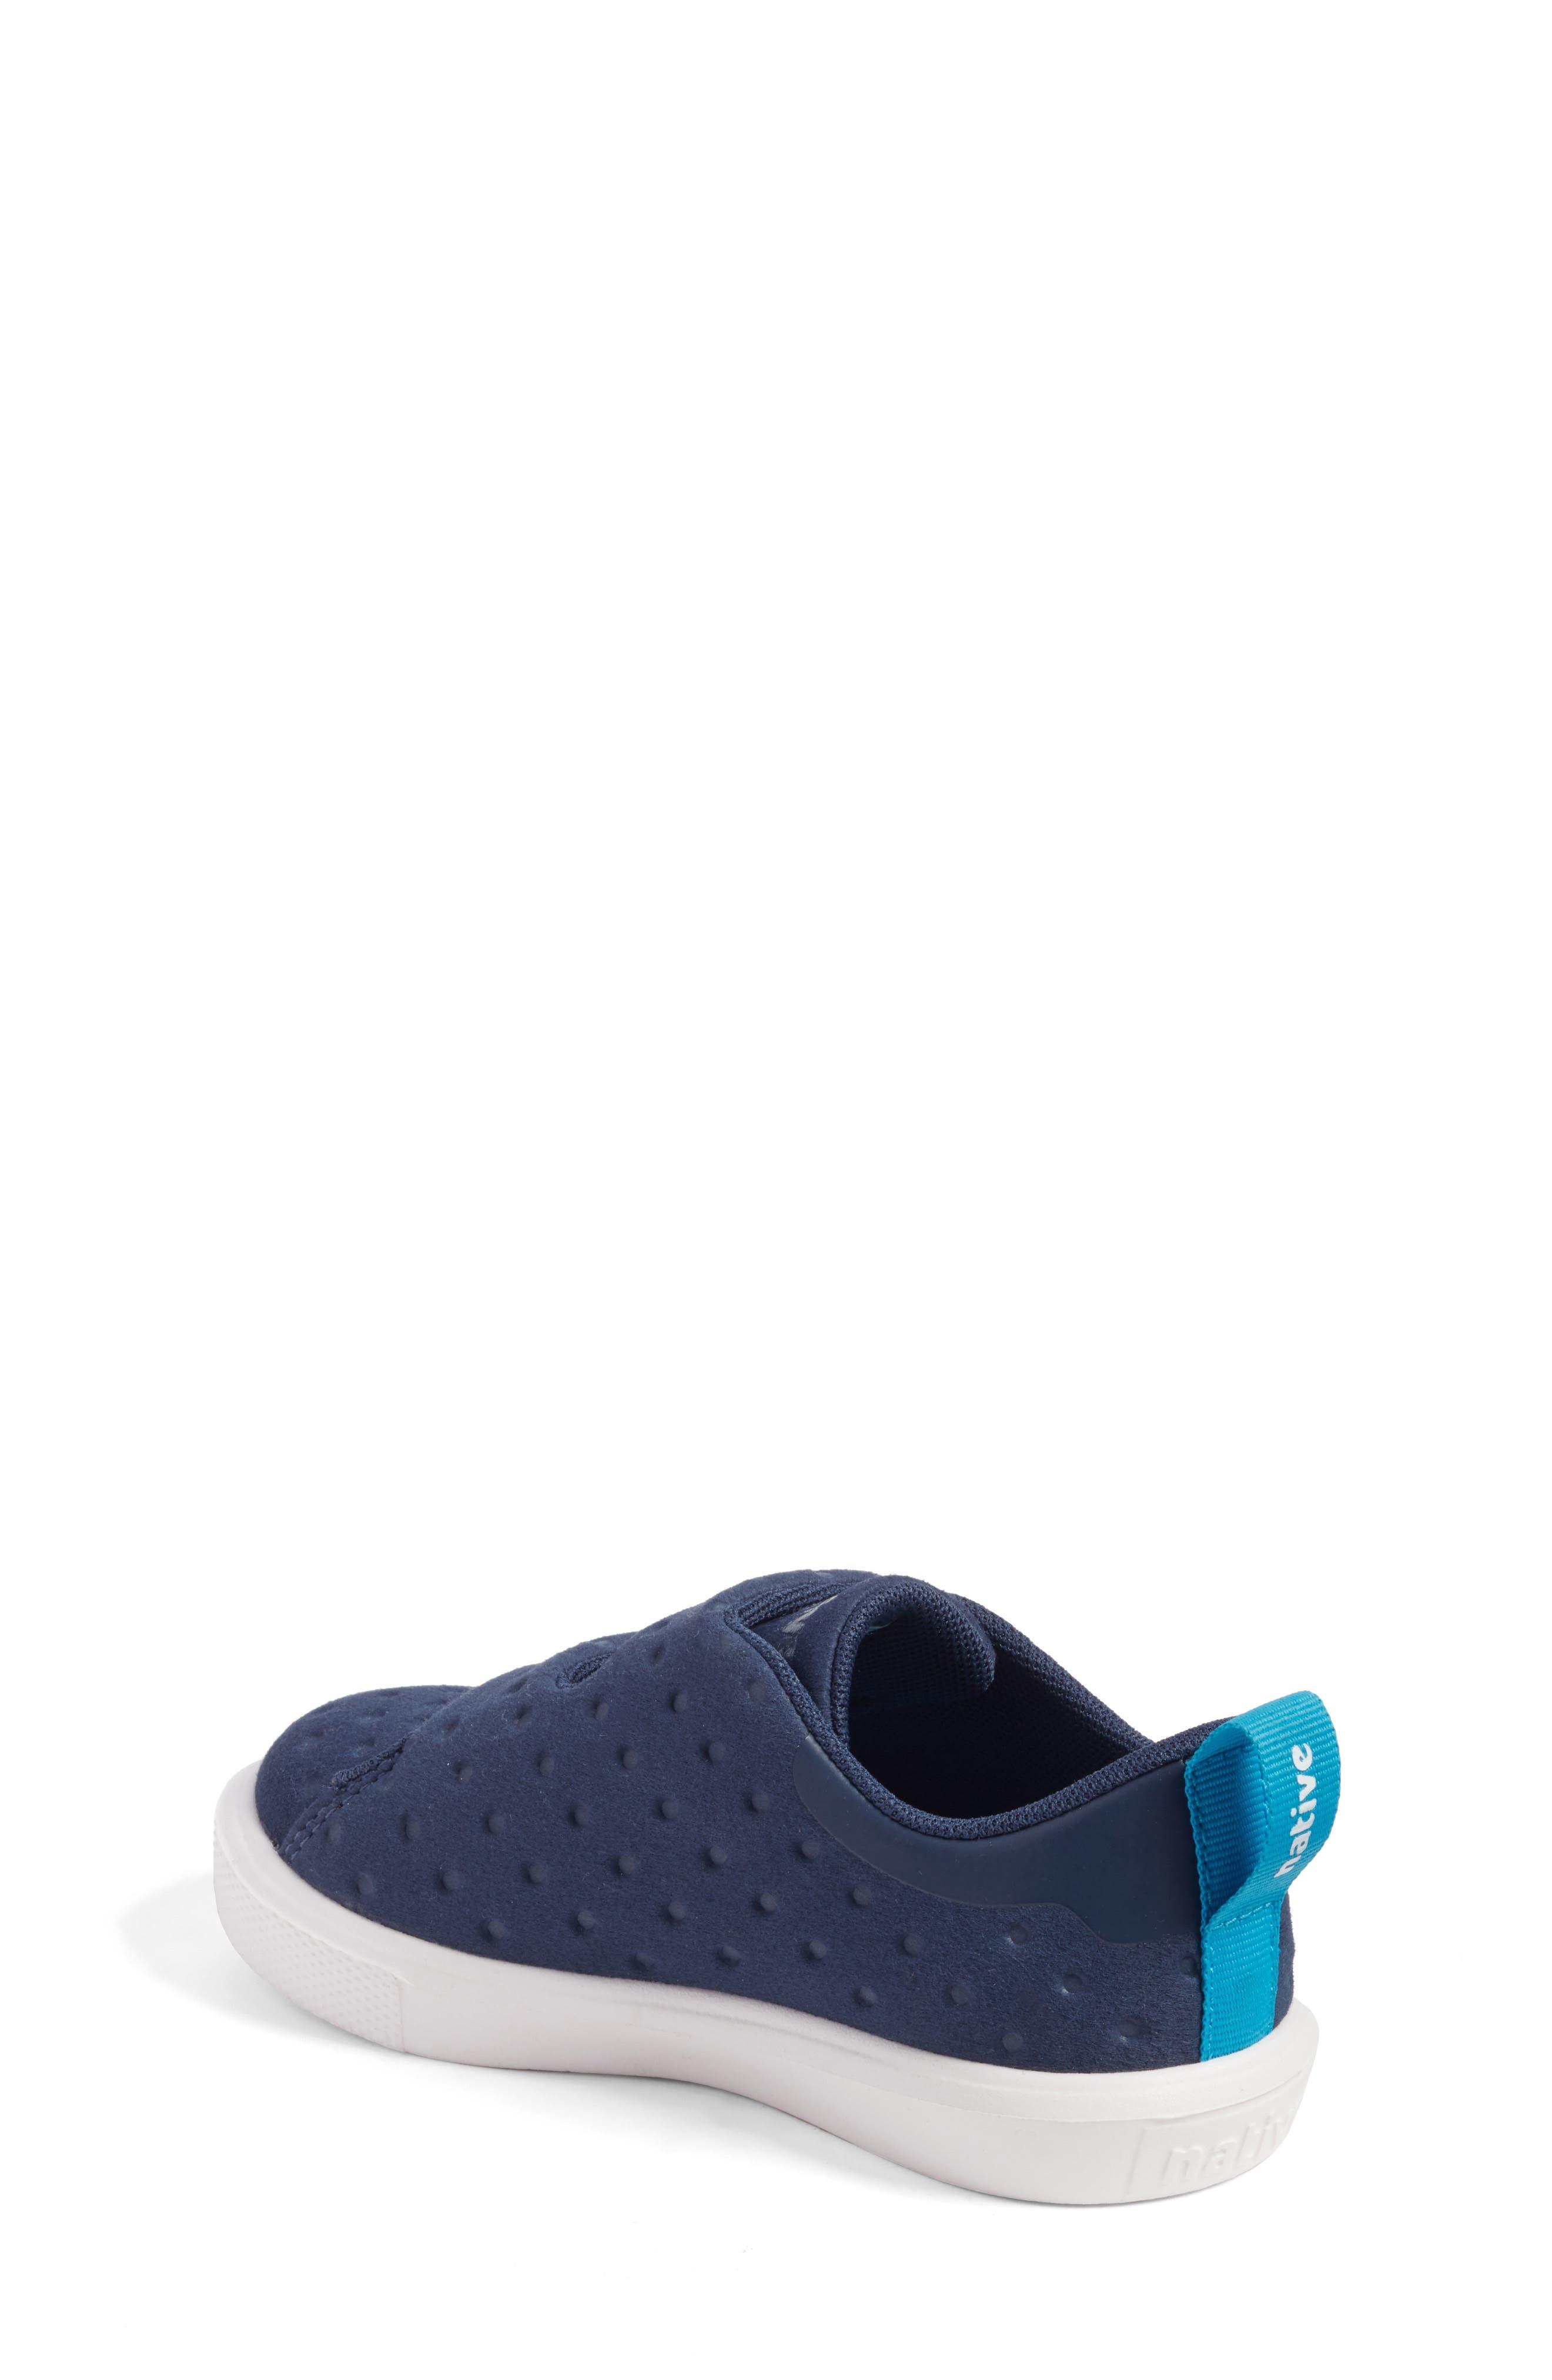 Monaco Sneaker,                             Alternate thumbnail 2, color,                             REGATTA BLUE/ SHELL WHITE